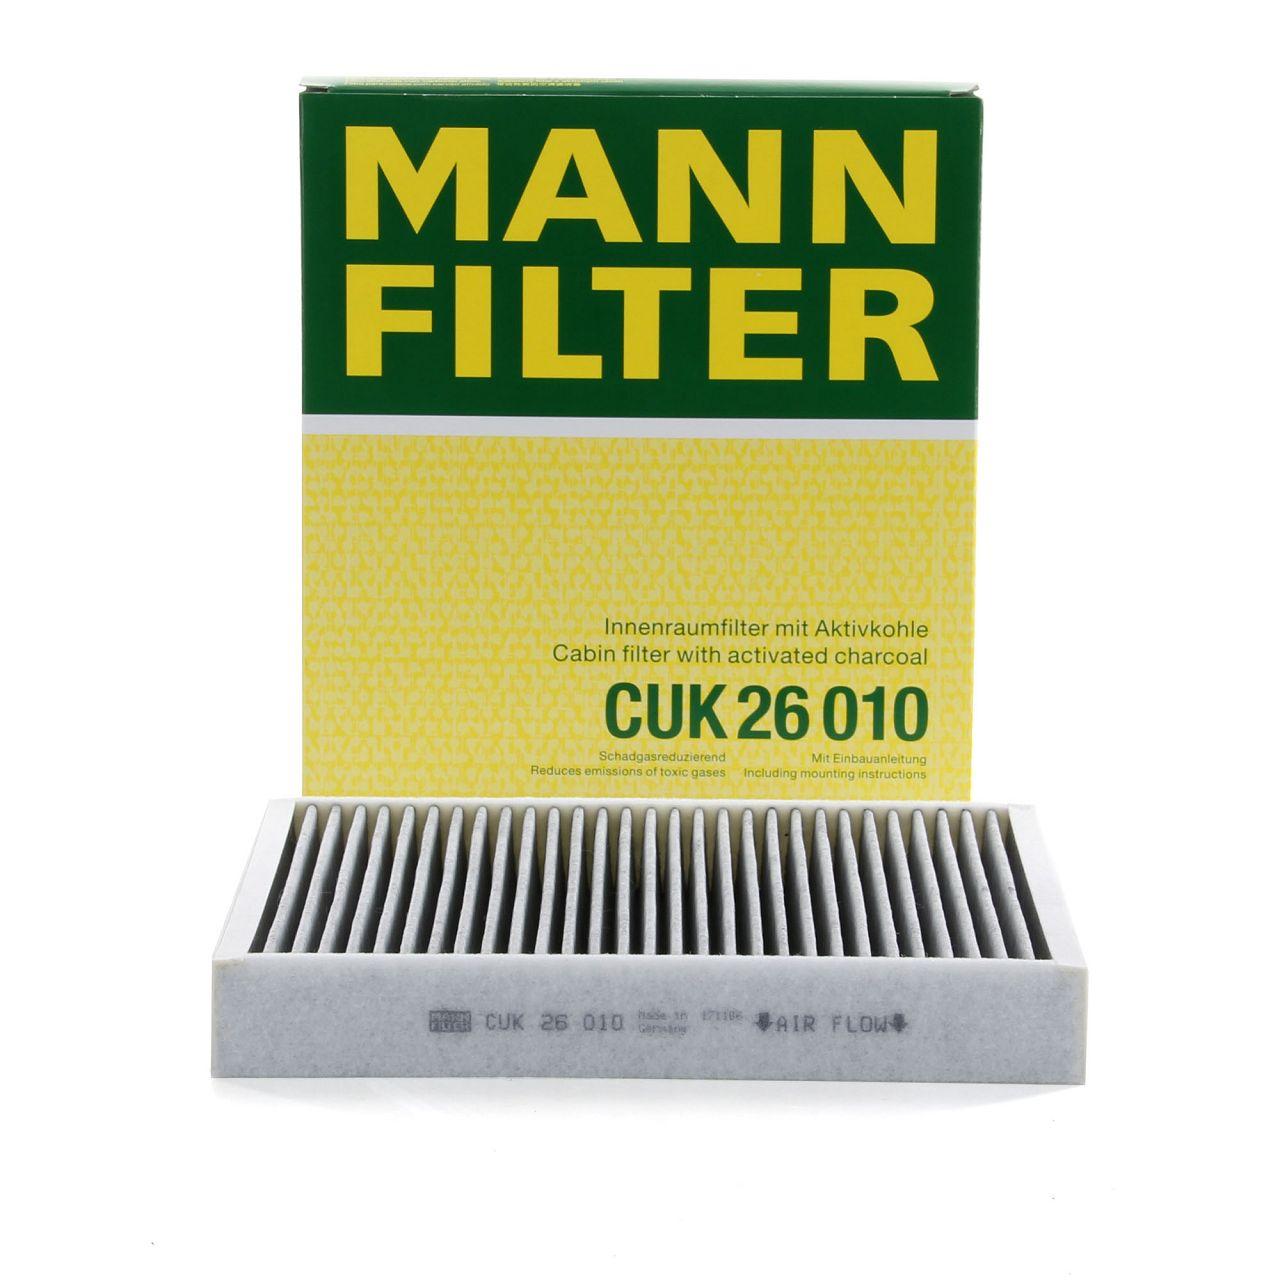 MANN Innenraumfilter Aktivkohle CUK26010 für AUDI A1 SEAT SKODA VW POLO 6R 6C